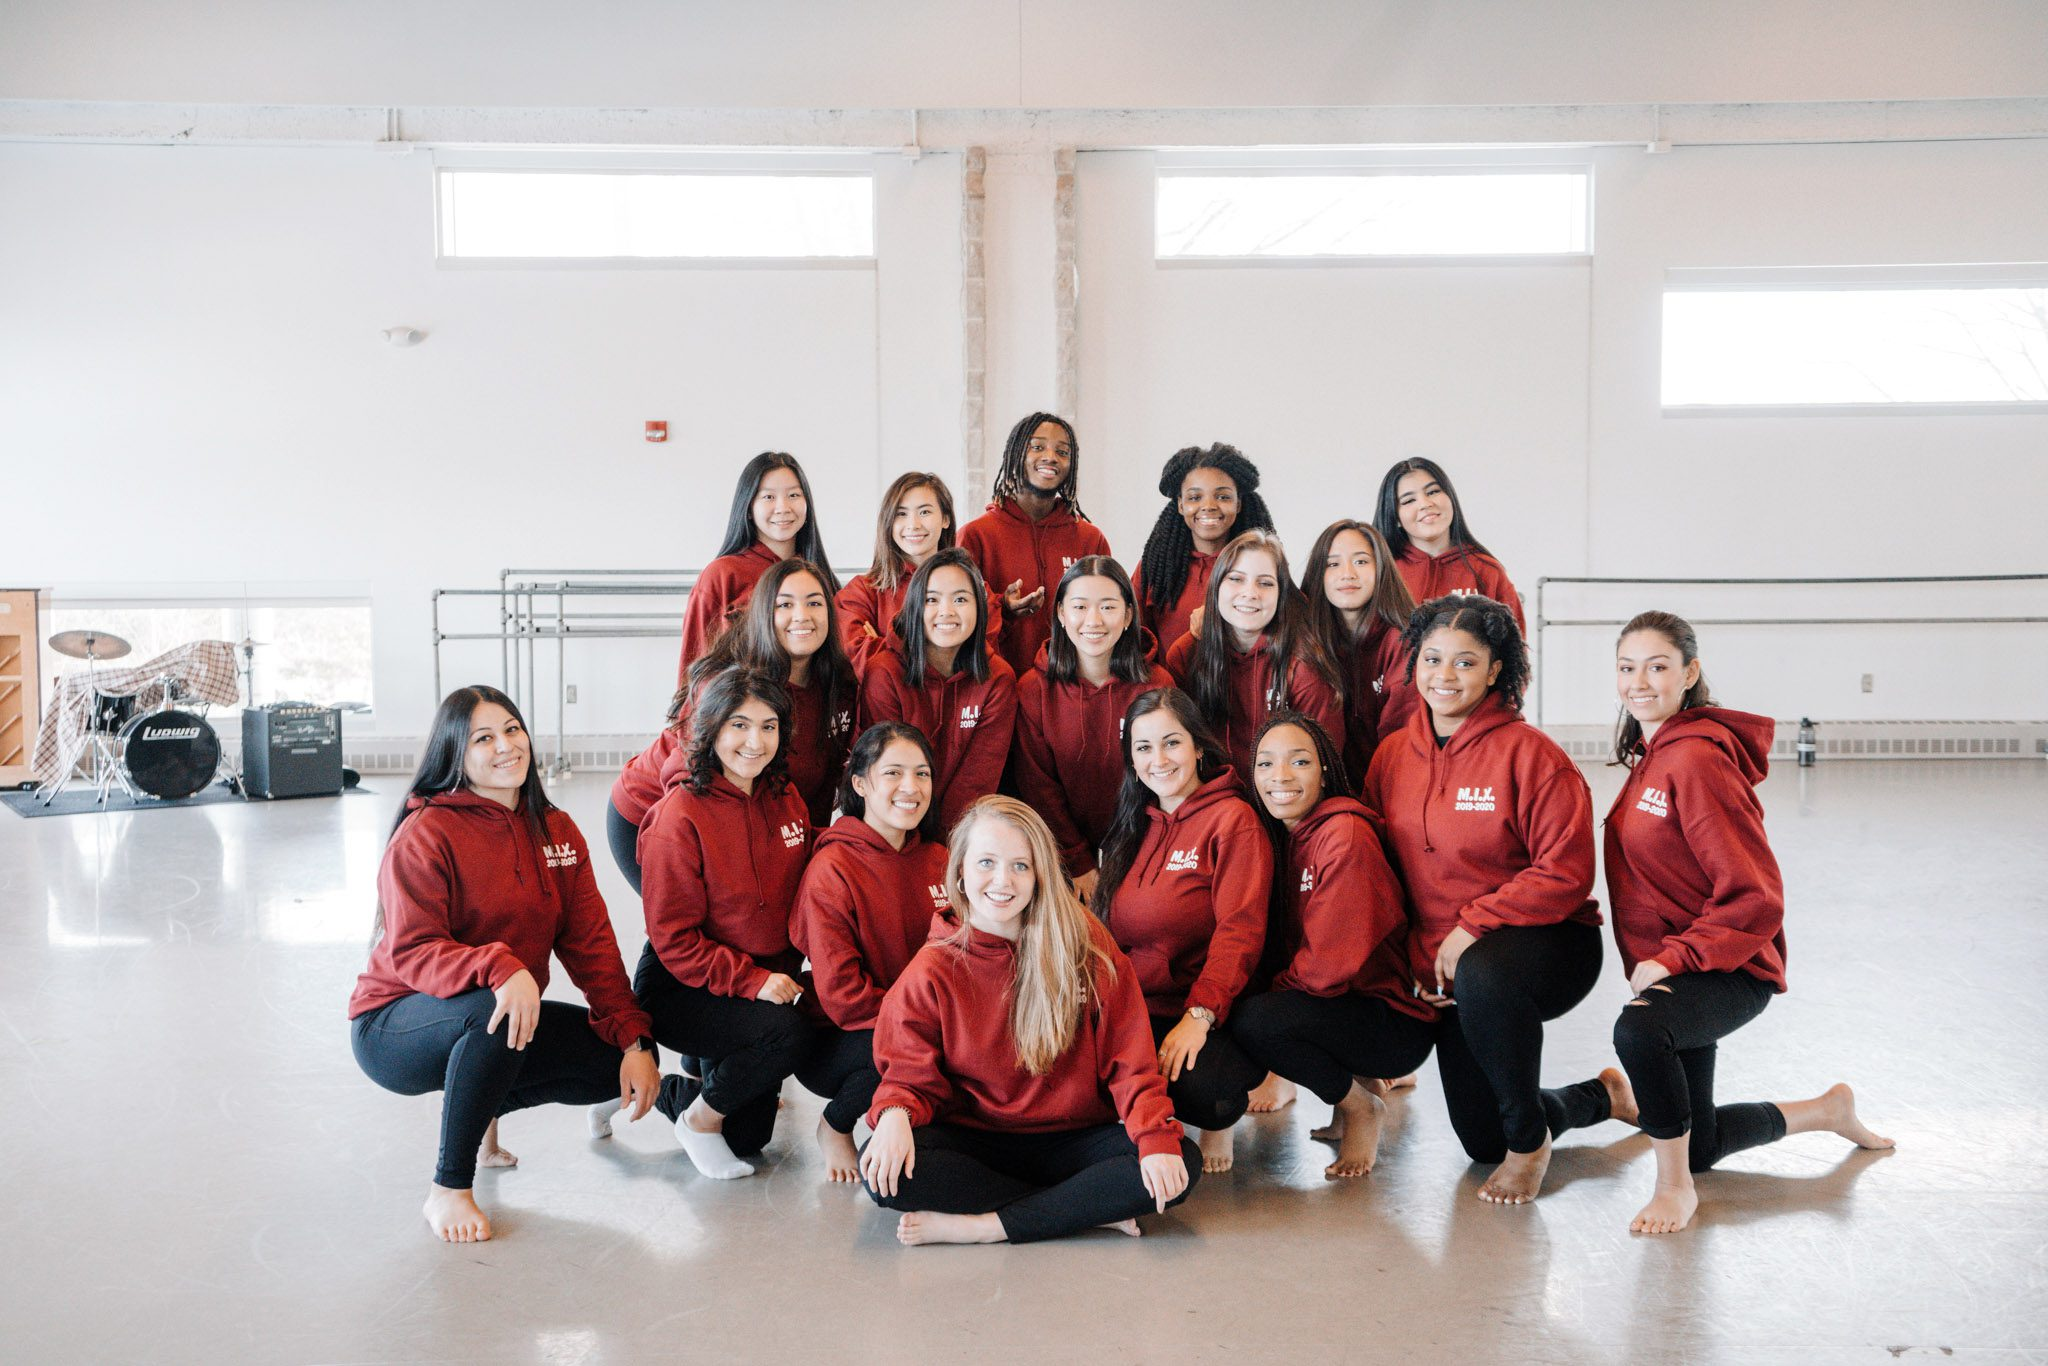 Portrait of M.I.X. members in a dance studio.